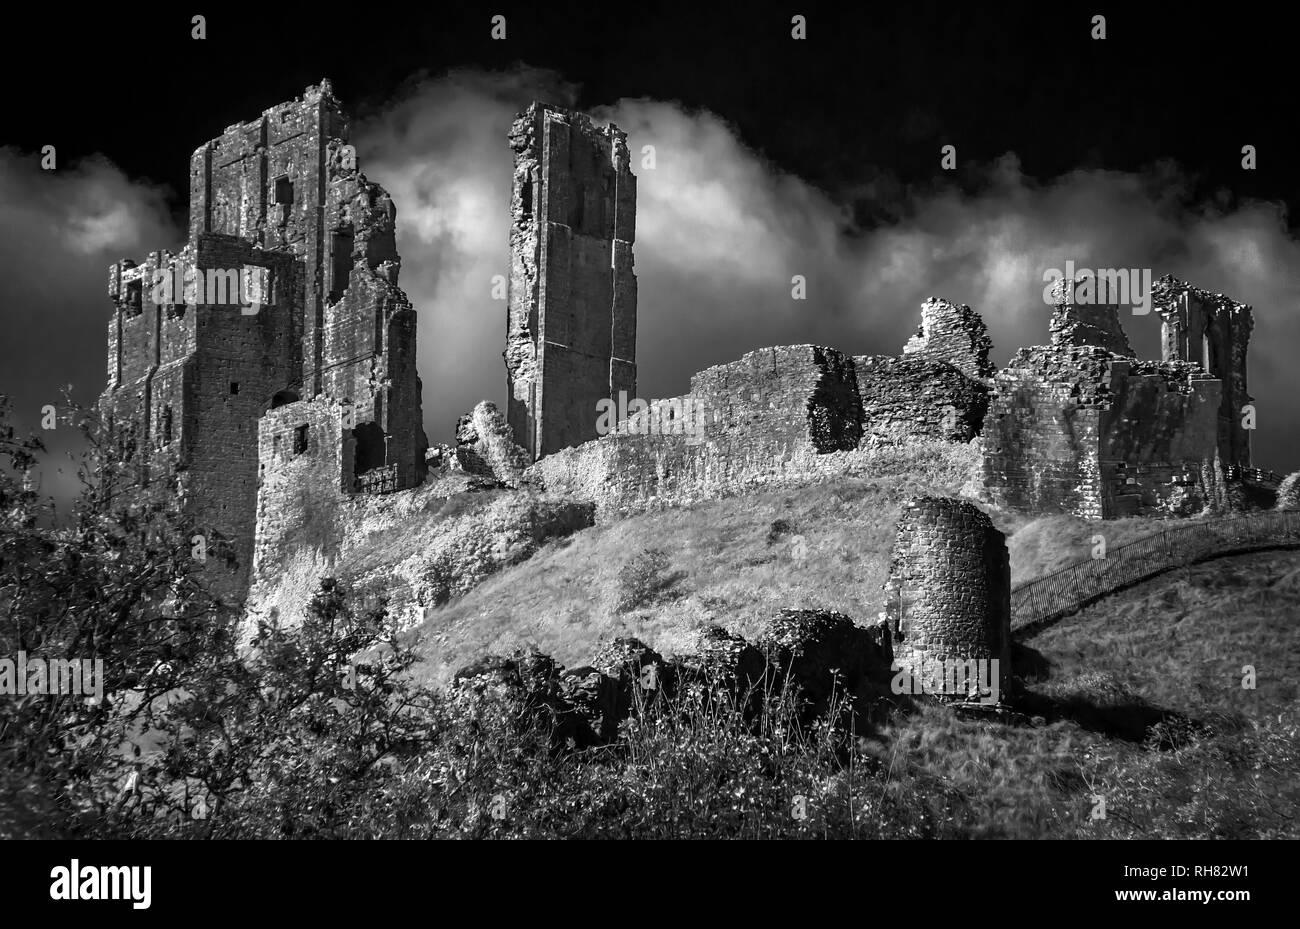 Infrared monochrome image of Corfe Castle in Dorset England - Stock Image